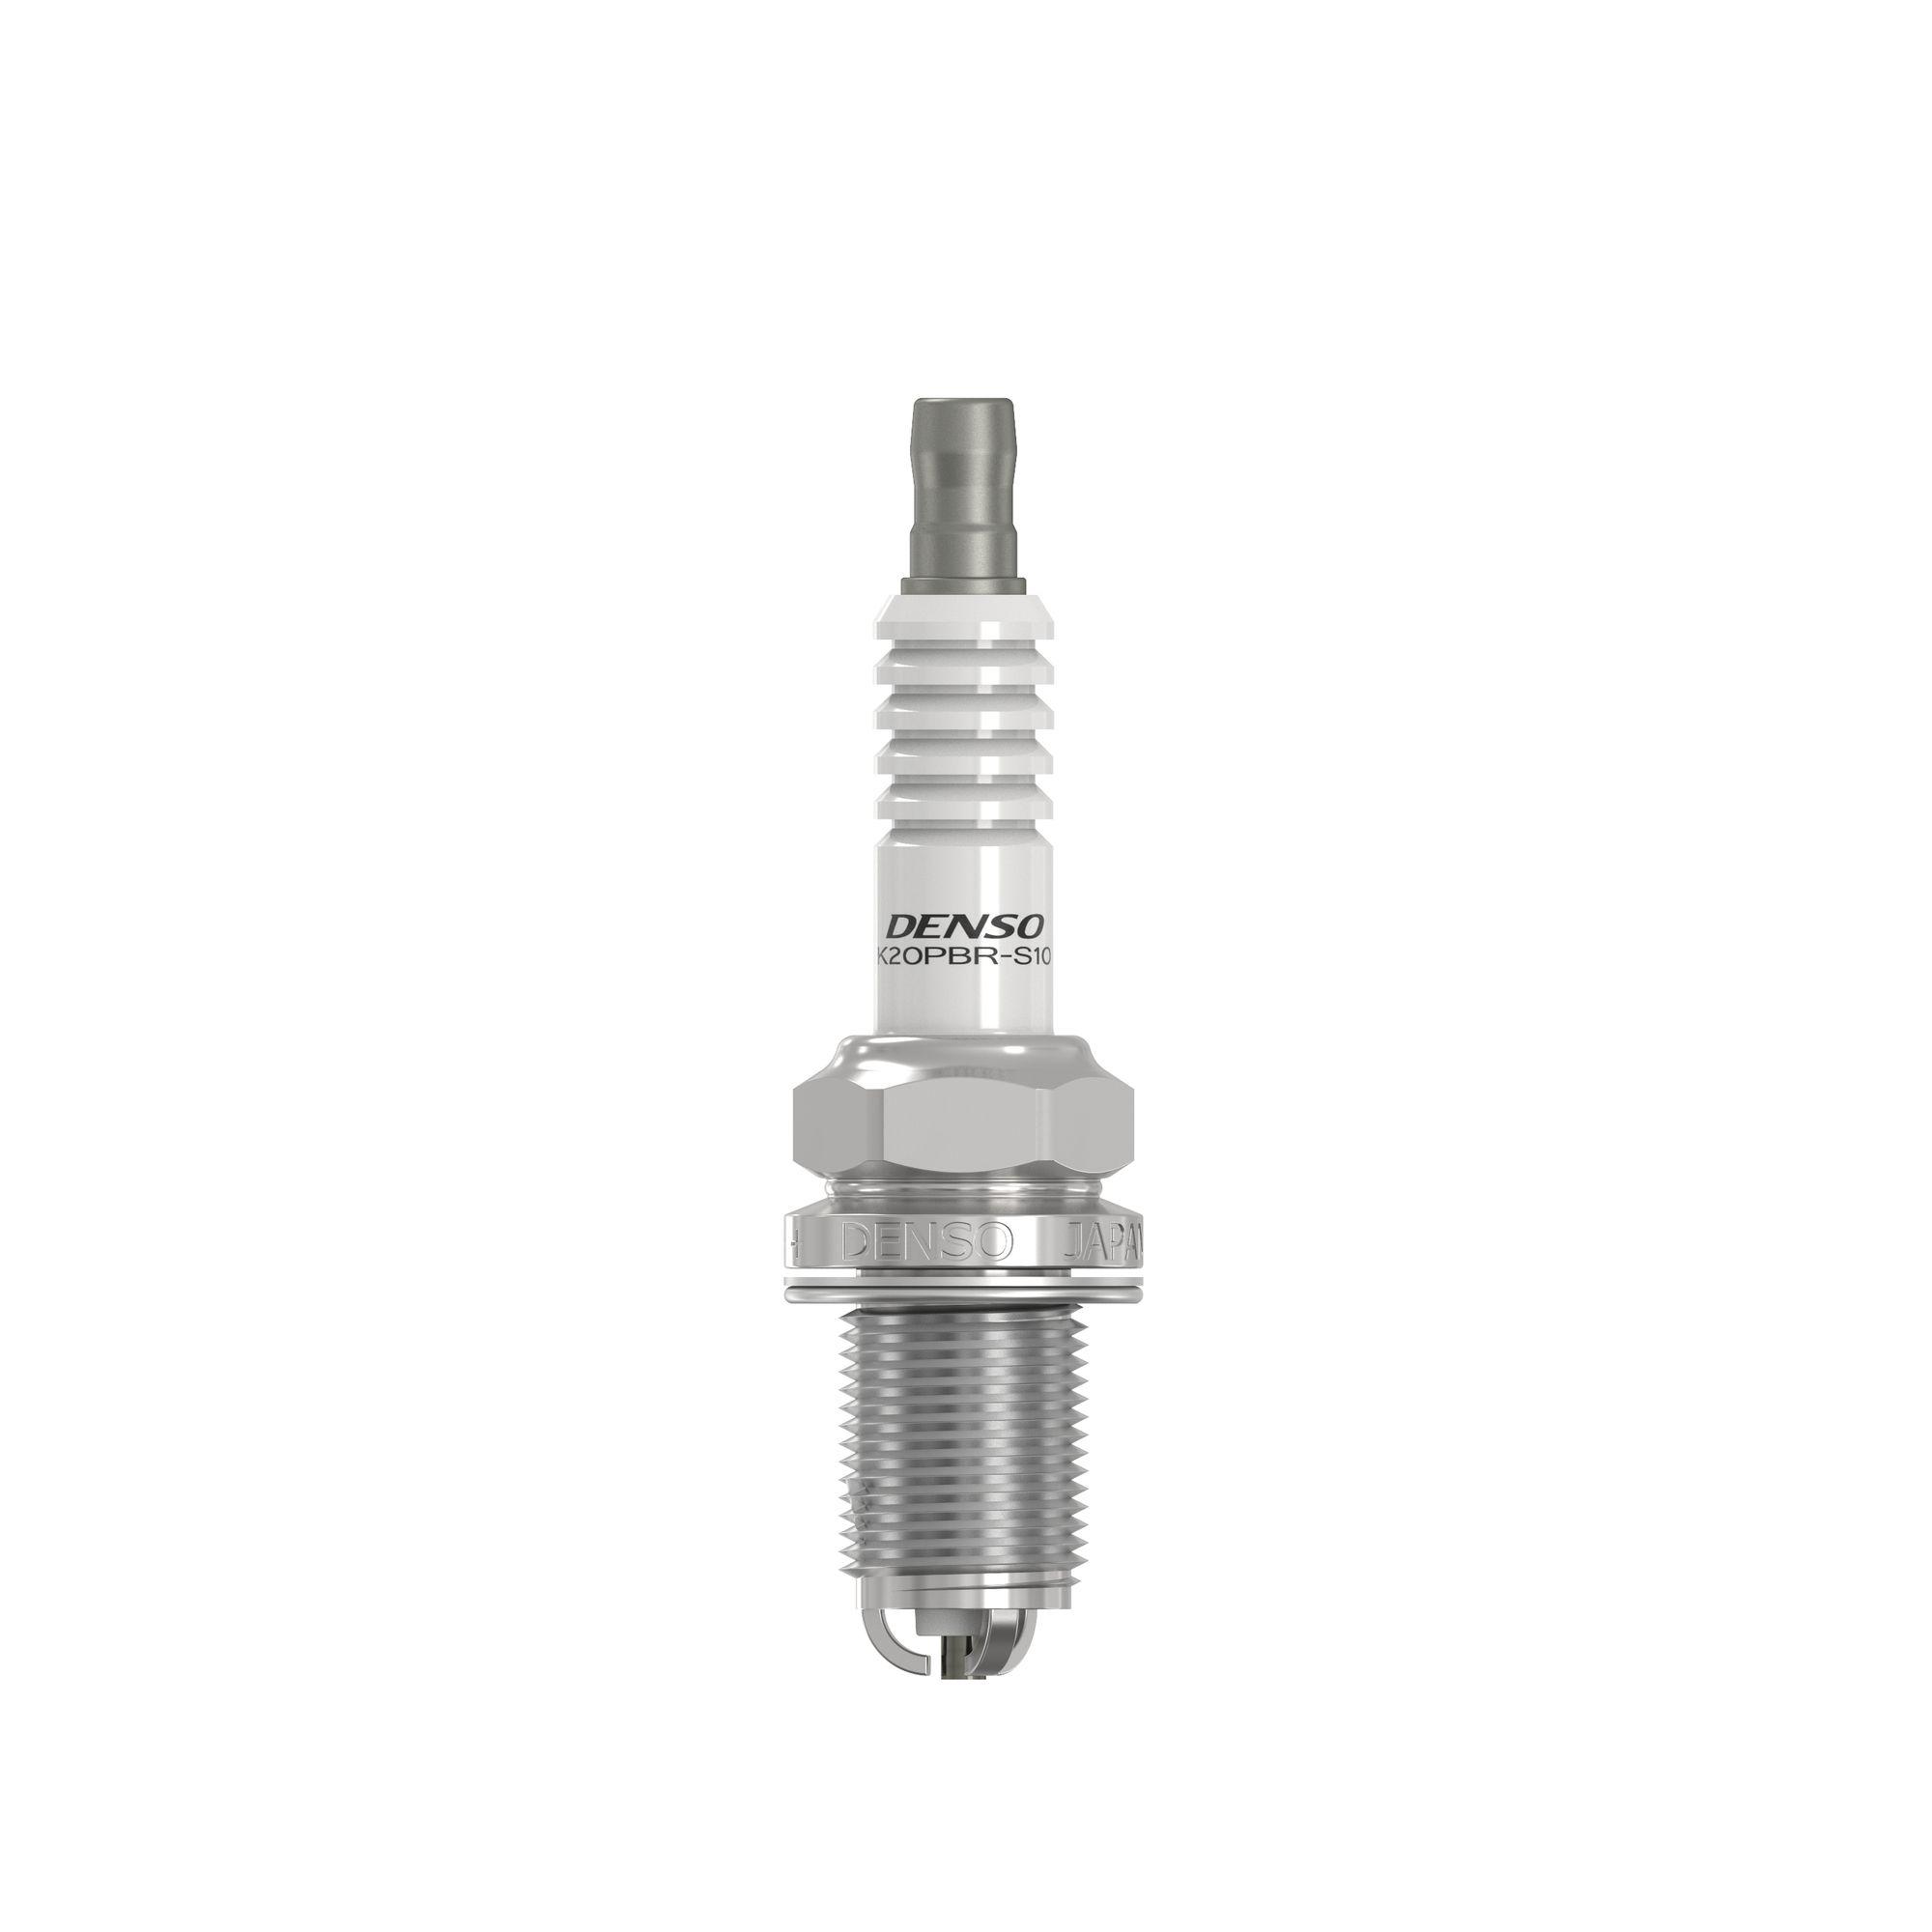 Tennplugg K20PBR-S10 til DAIHATSU lave priser - Handle nå!